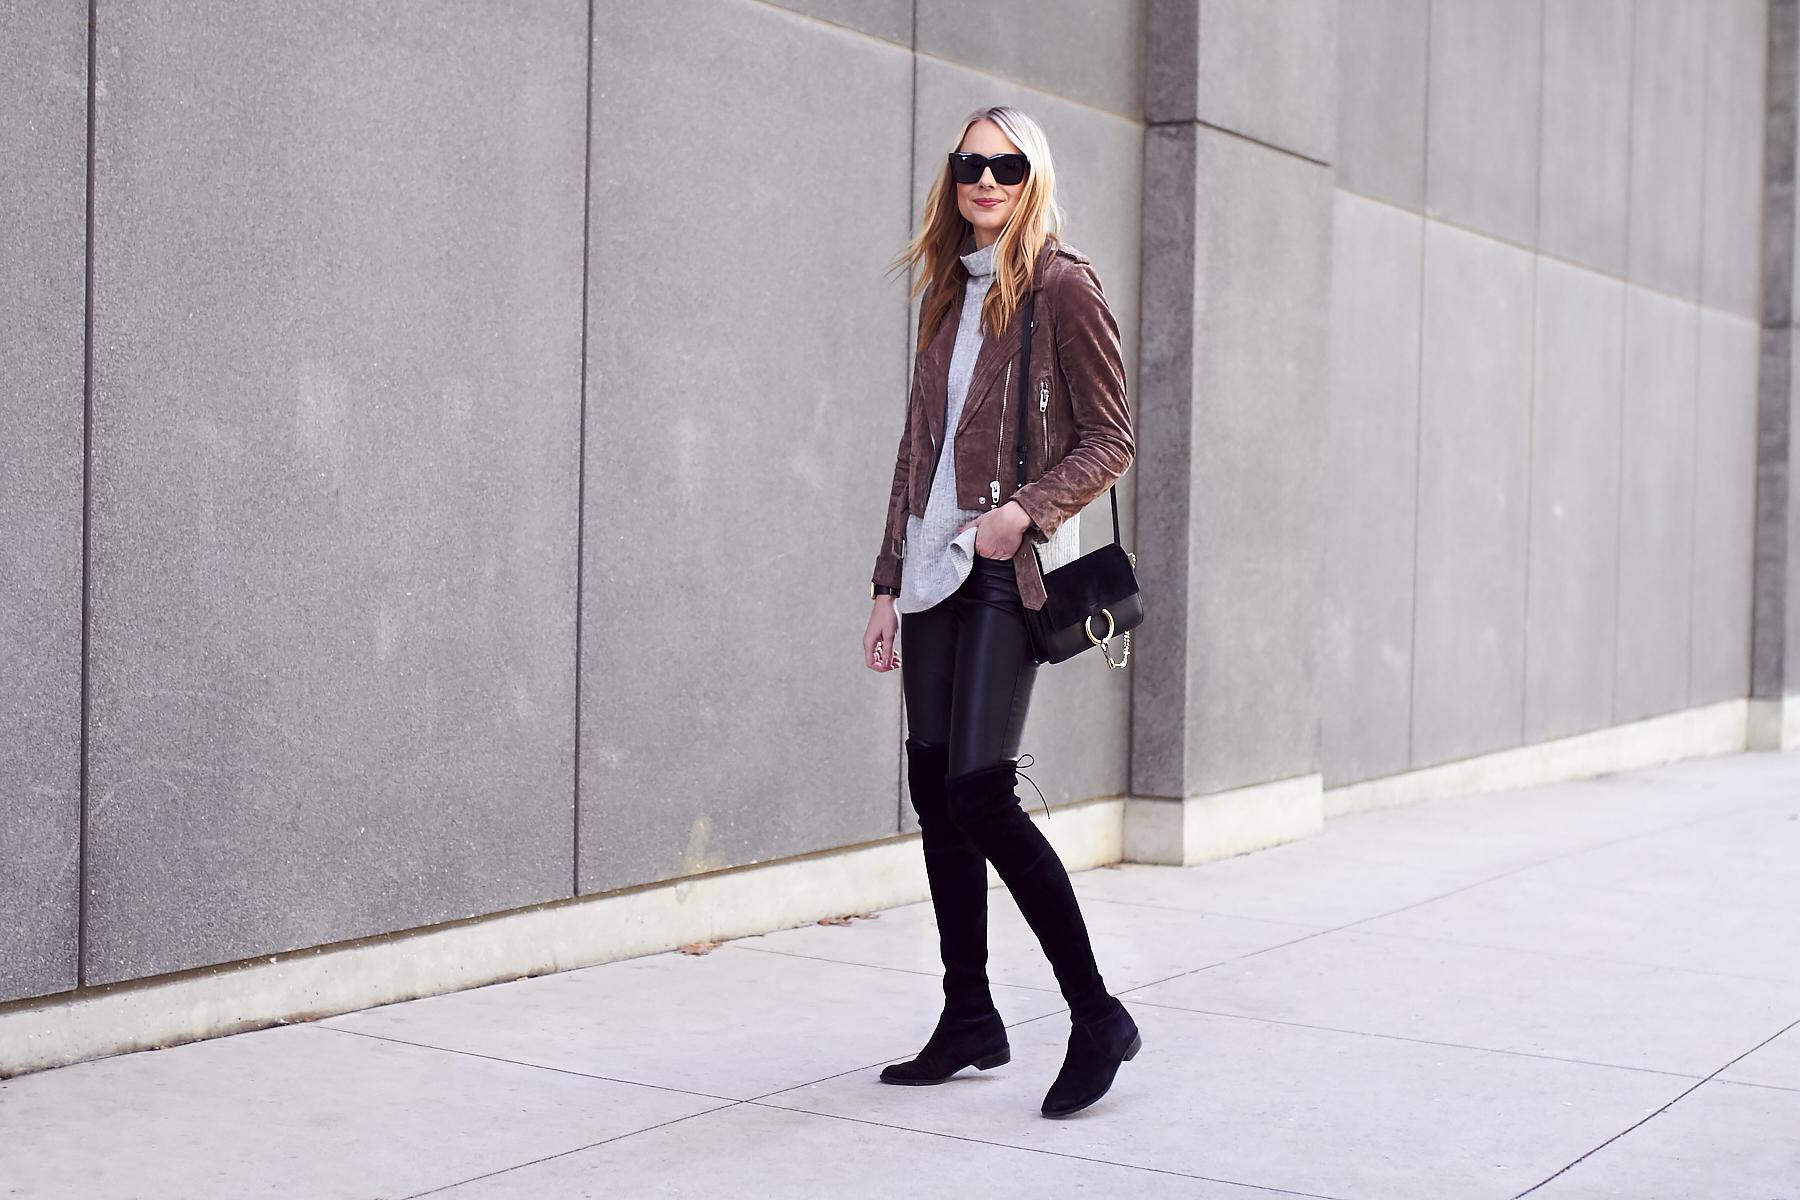 Fall Outfit, Brown Suede Moto Jacket, Grey Sweater, Stuart Weitzman Lowland Black Boots, Chloe Faye Handbag